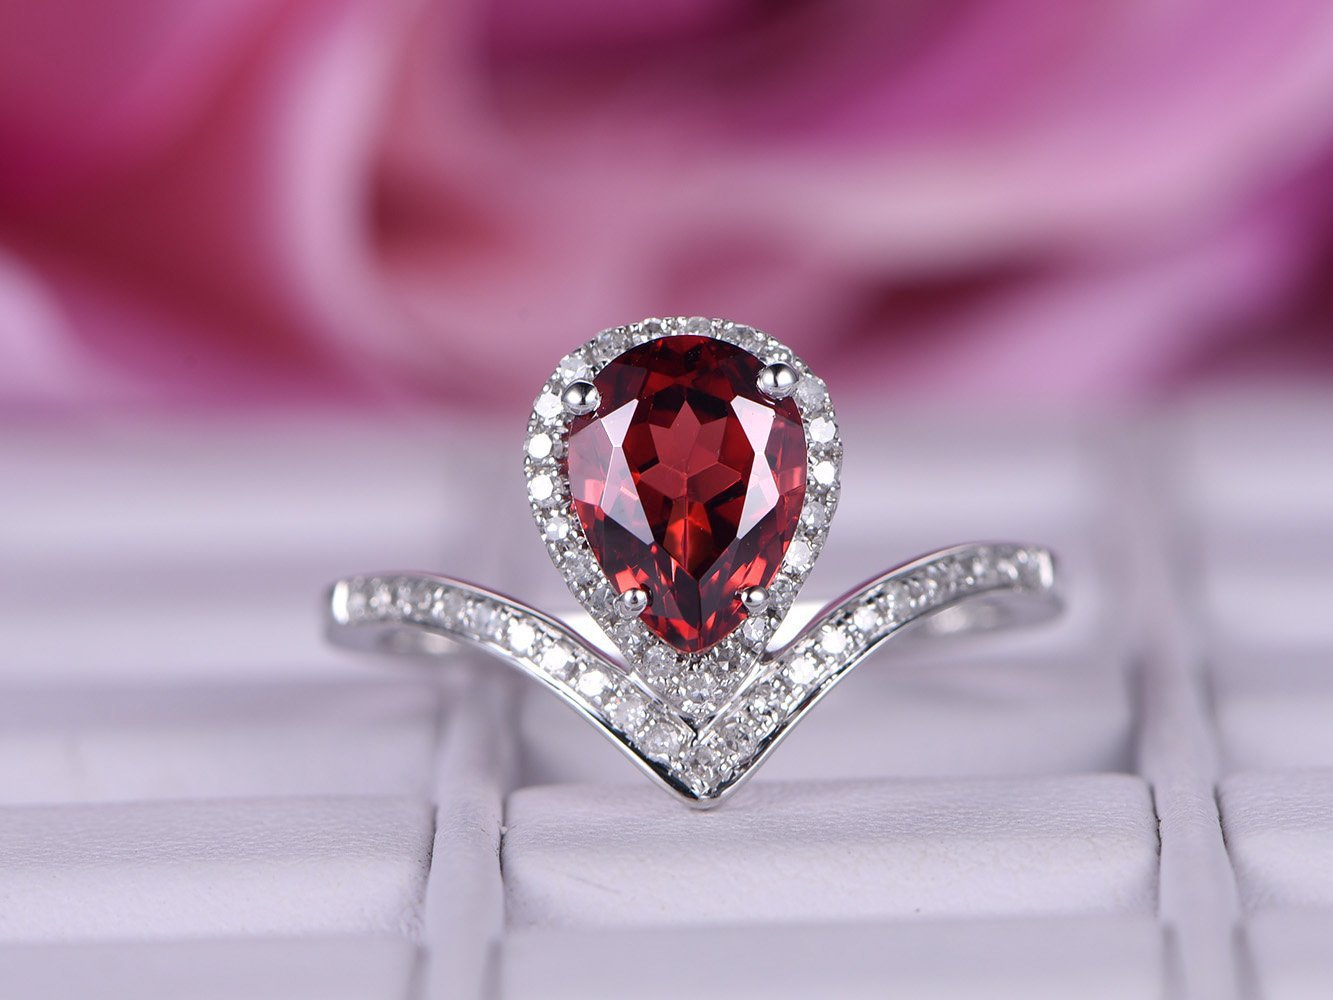 Pear Garnet Engagement Ring Pave Diamond Wedding 14k White Gold 6x8mm